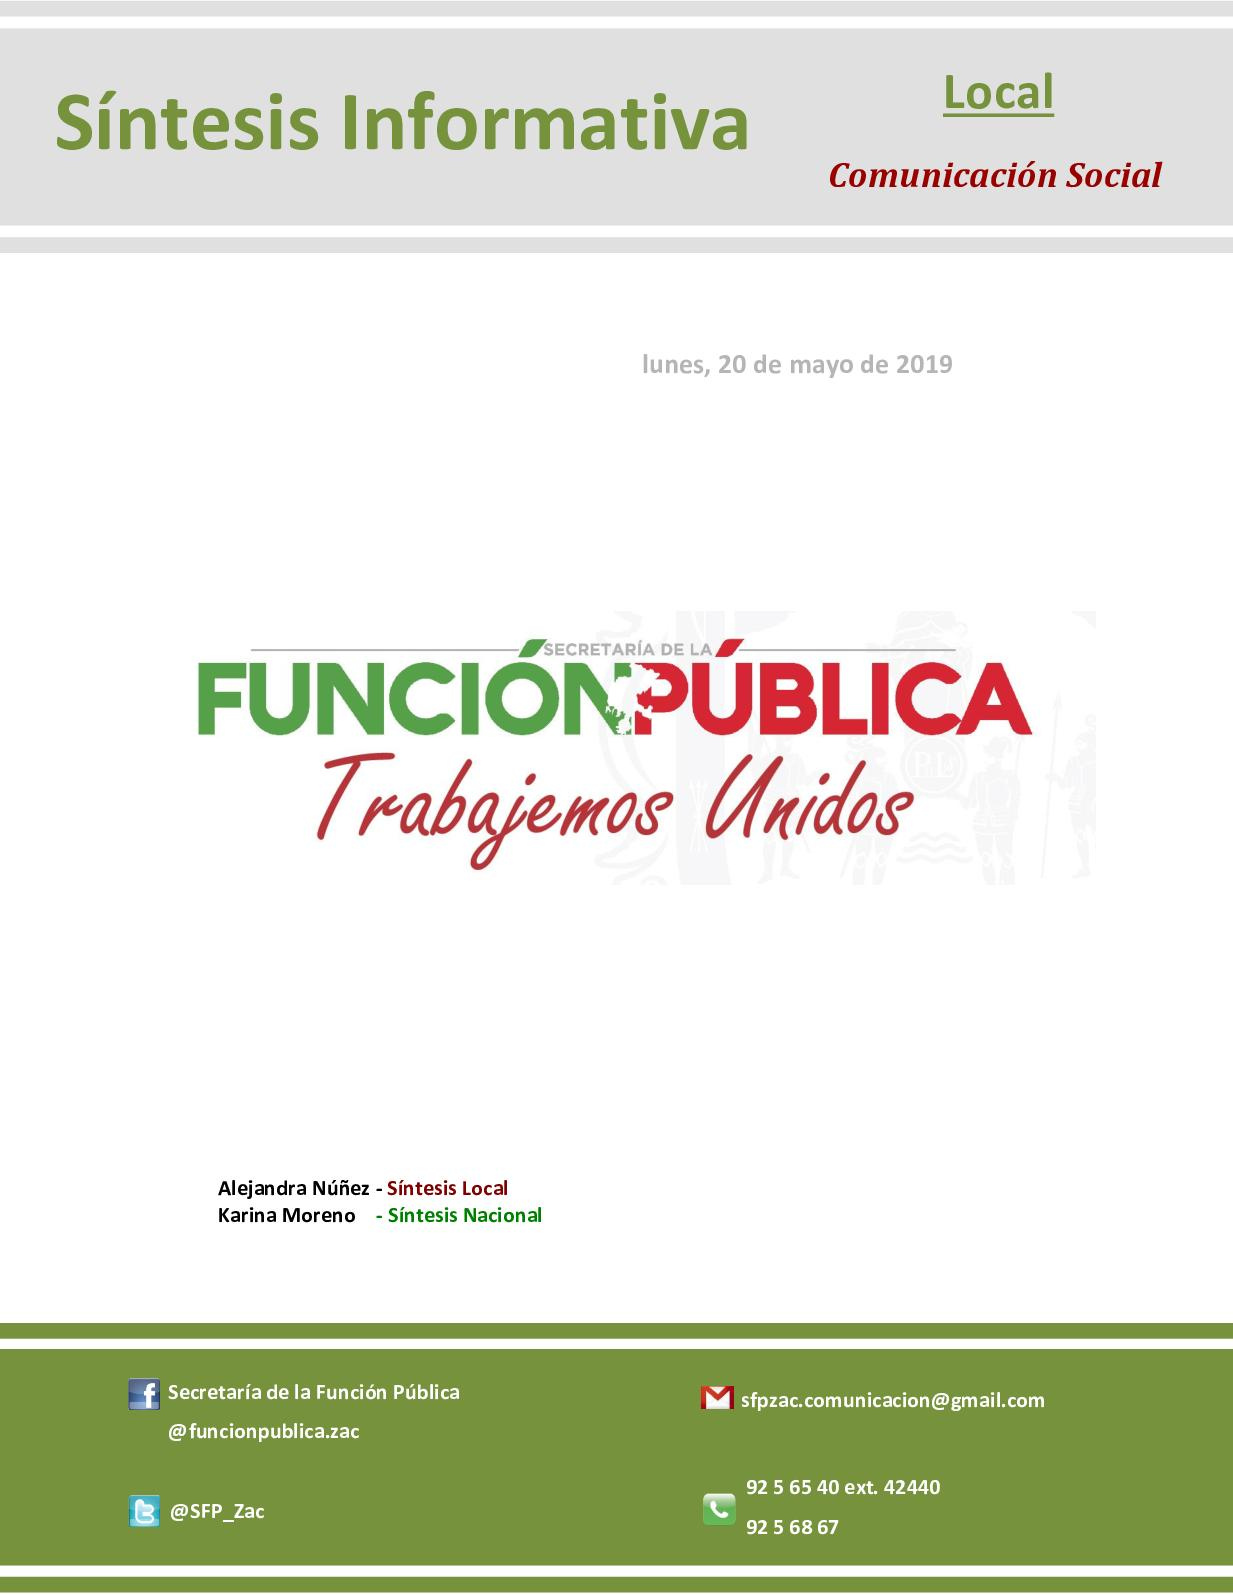 Síntesis Local-Nacional de Comunicación Social de la SFP 20-05-2019